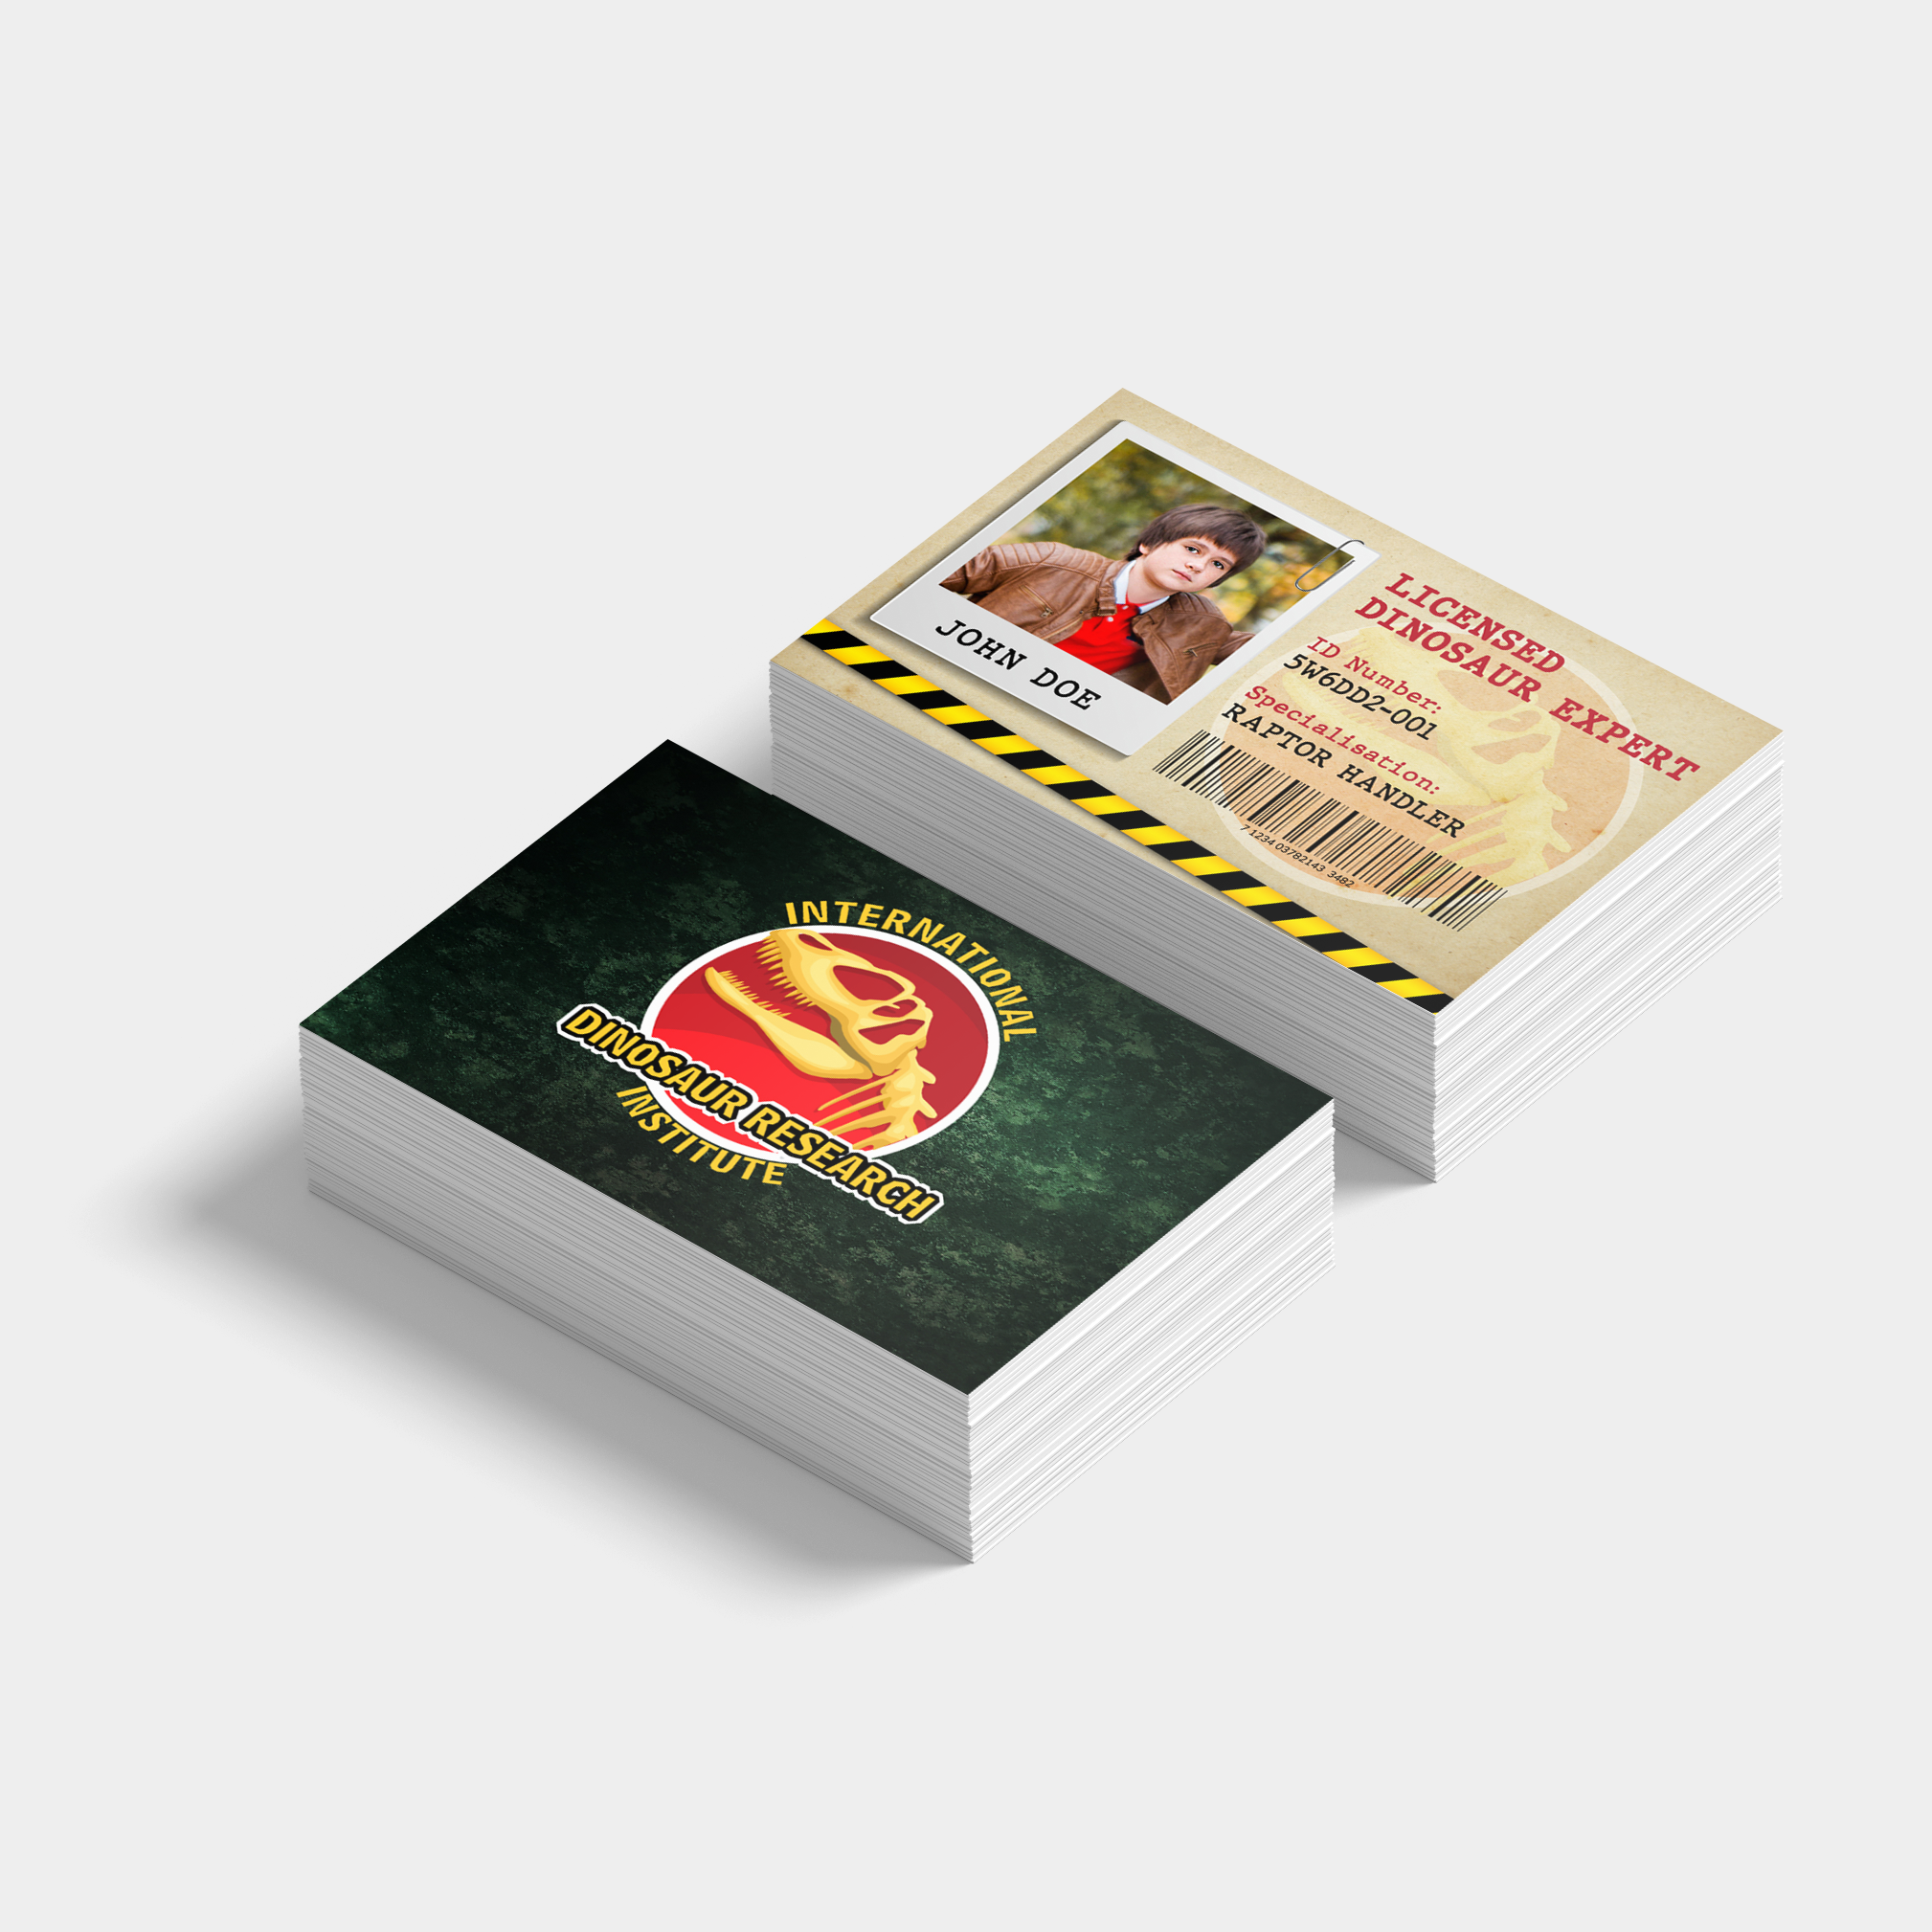 Dinosaur Explorer Namecards (85 x 55mm) - Starting from $16.00/ box of 100 cards